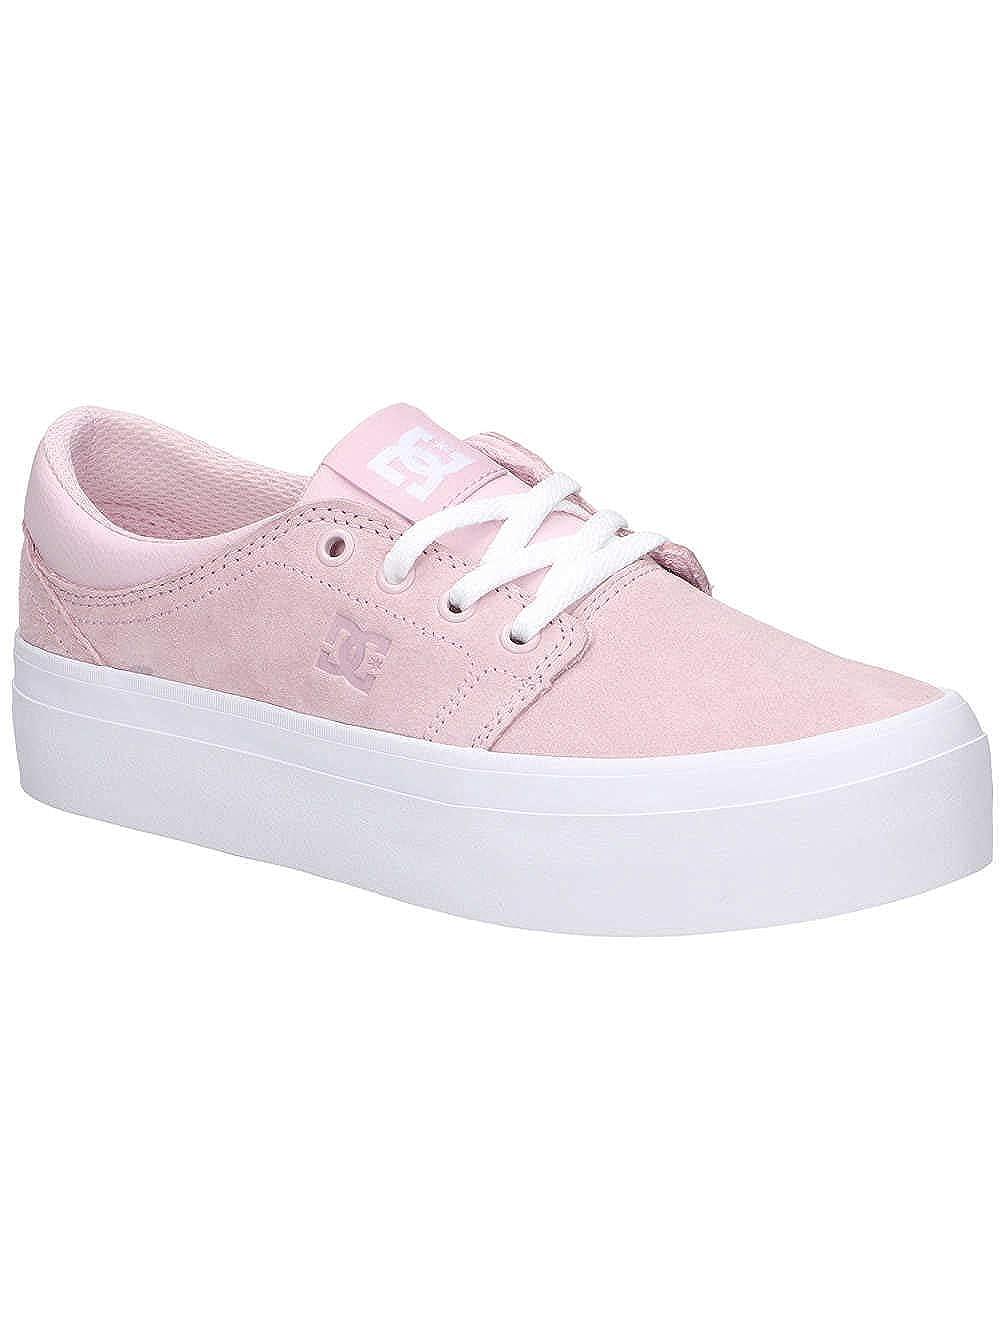 DC Women's Trase Pltfrm Se J Shoe Leather Sneakers: Buy